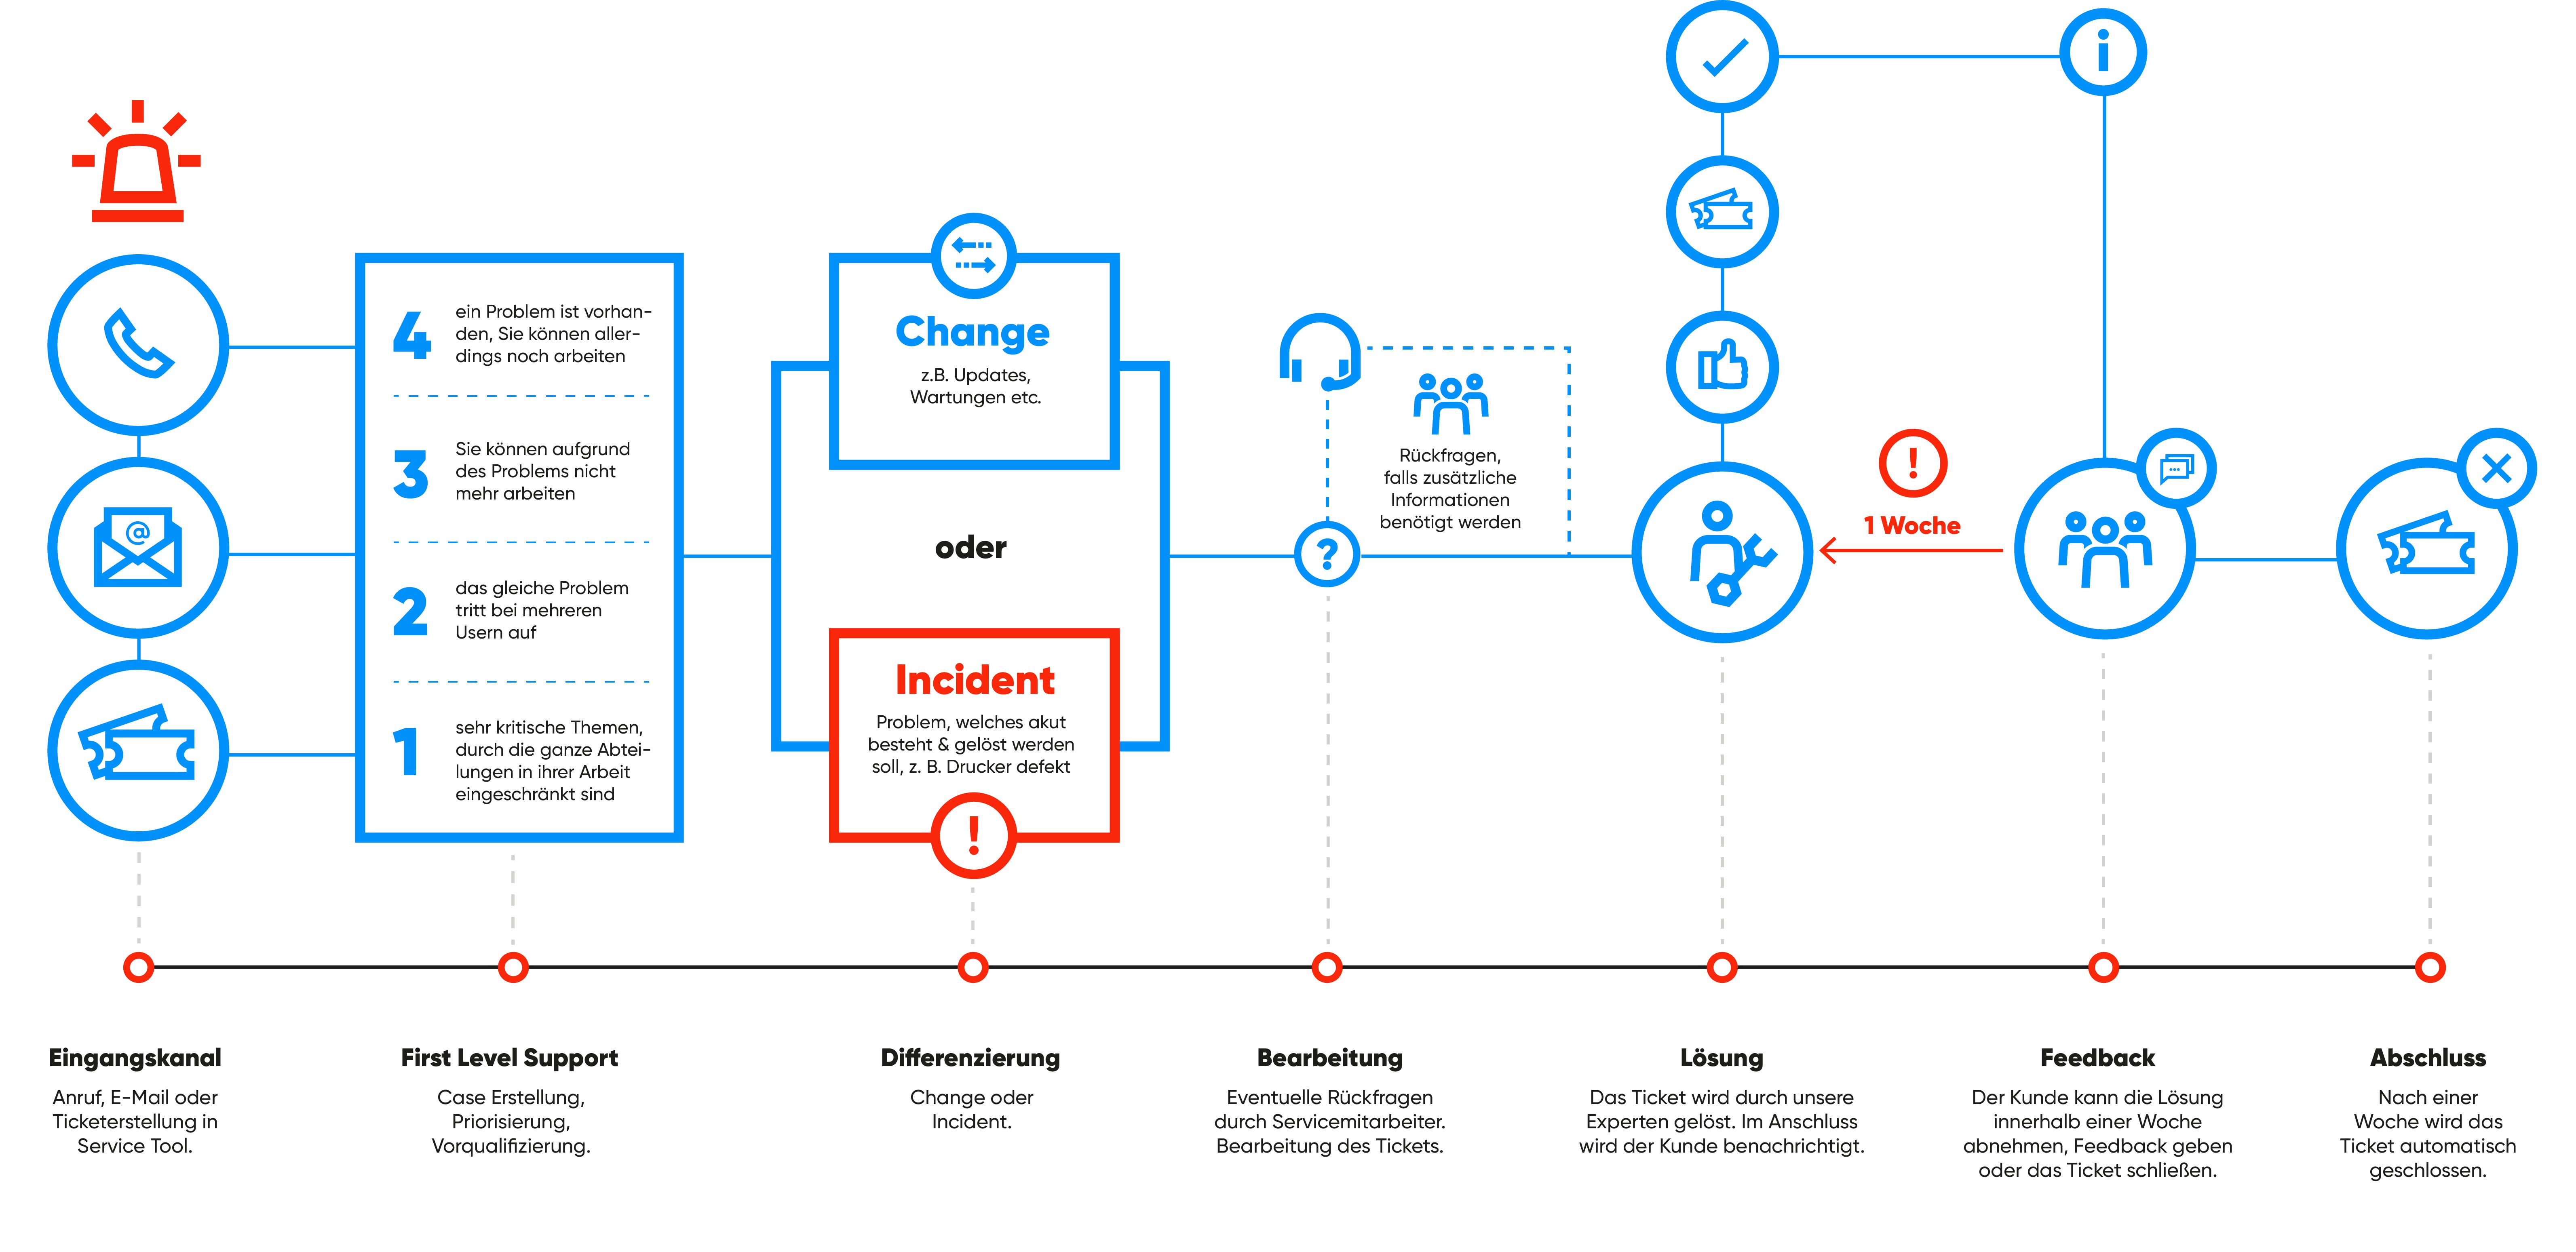 Infografik: So funktionieren unsere IT-Services